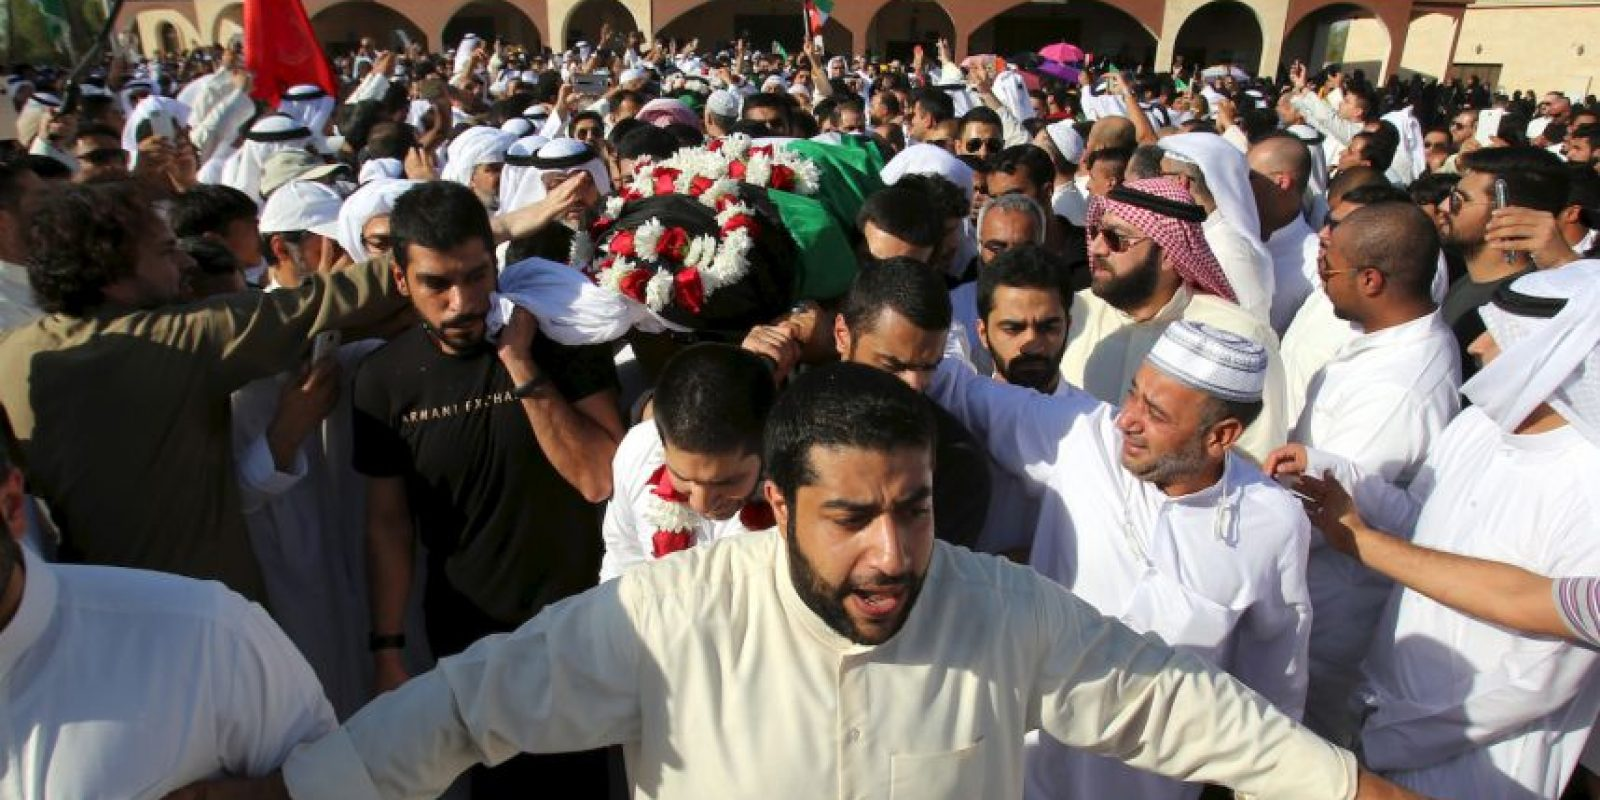 1. El atentado fue en la mezquita Imam Sadiq. Foto:AFP